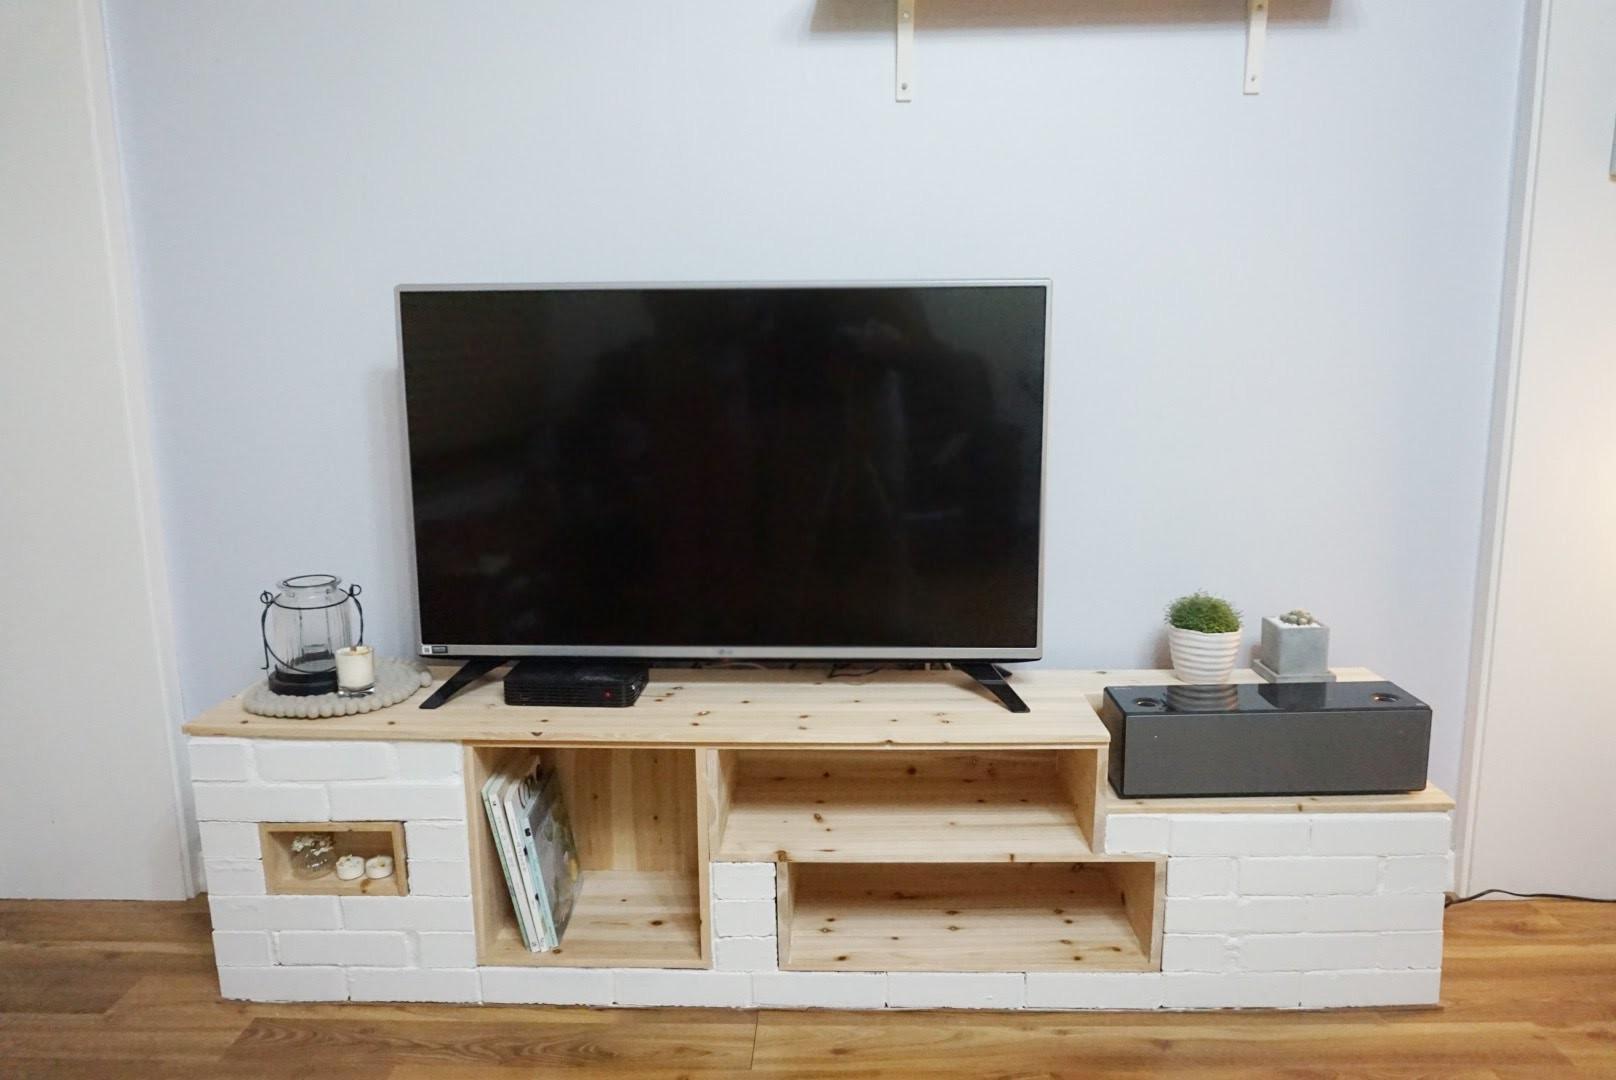 DIY*How to make an entertainment center